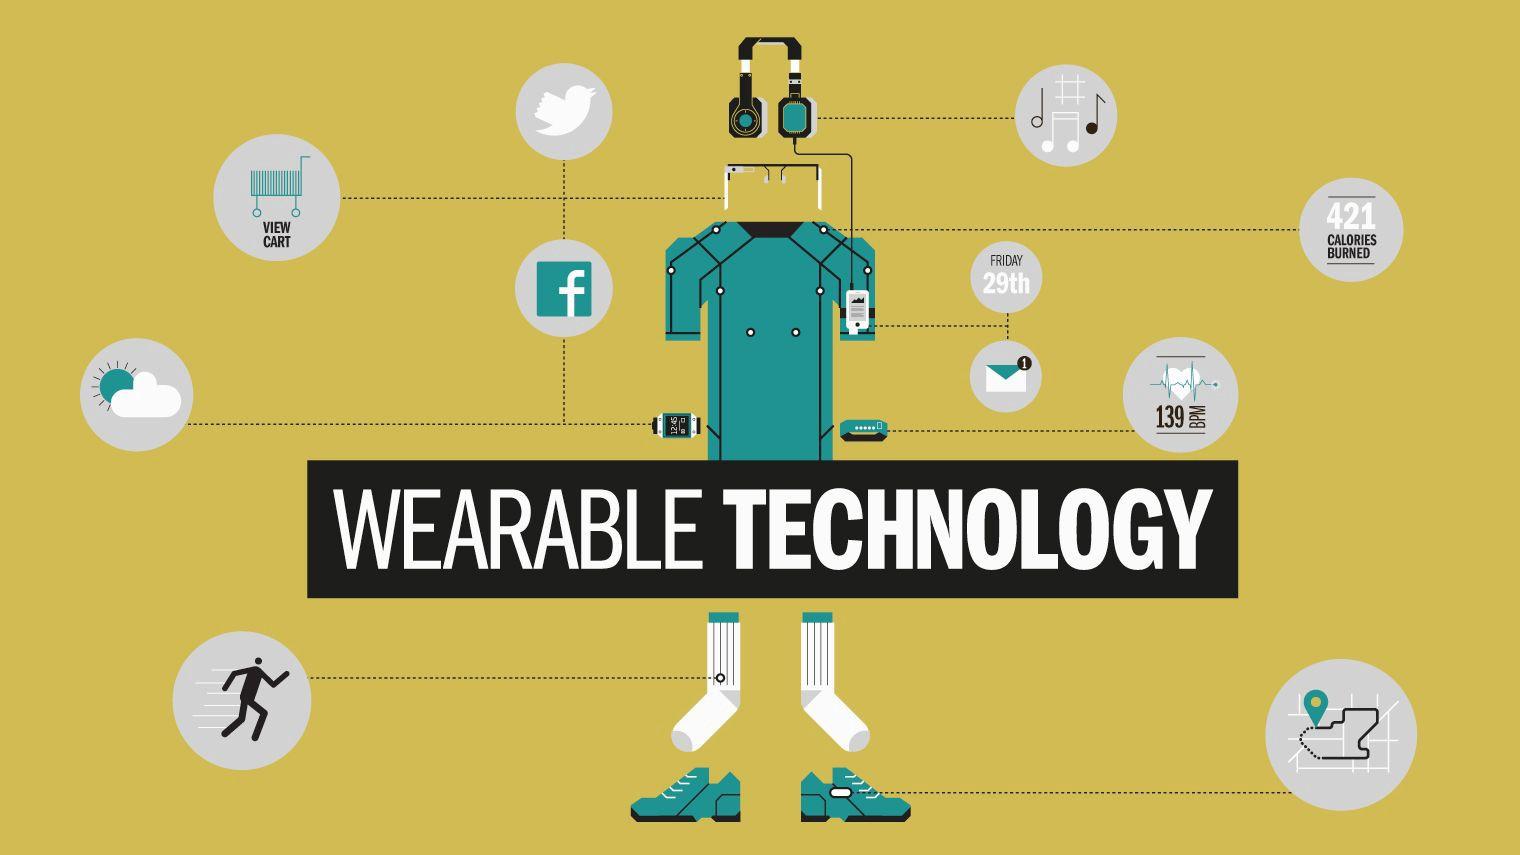 Wearable Tech: saiba o que é e como poderá impactar sua estratégia de marketing